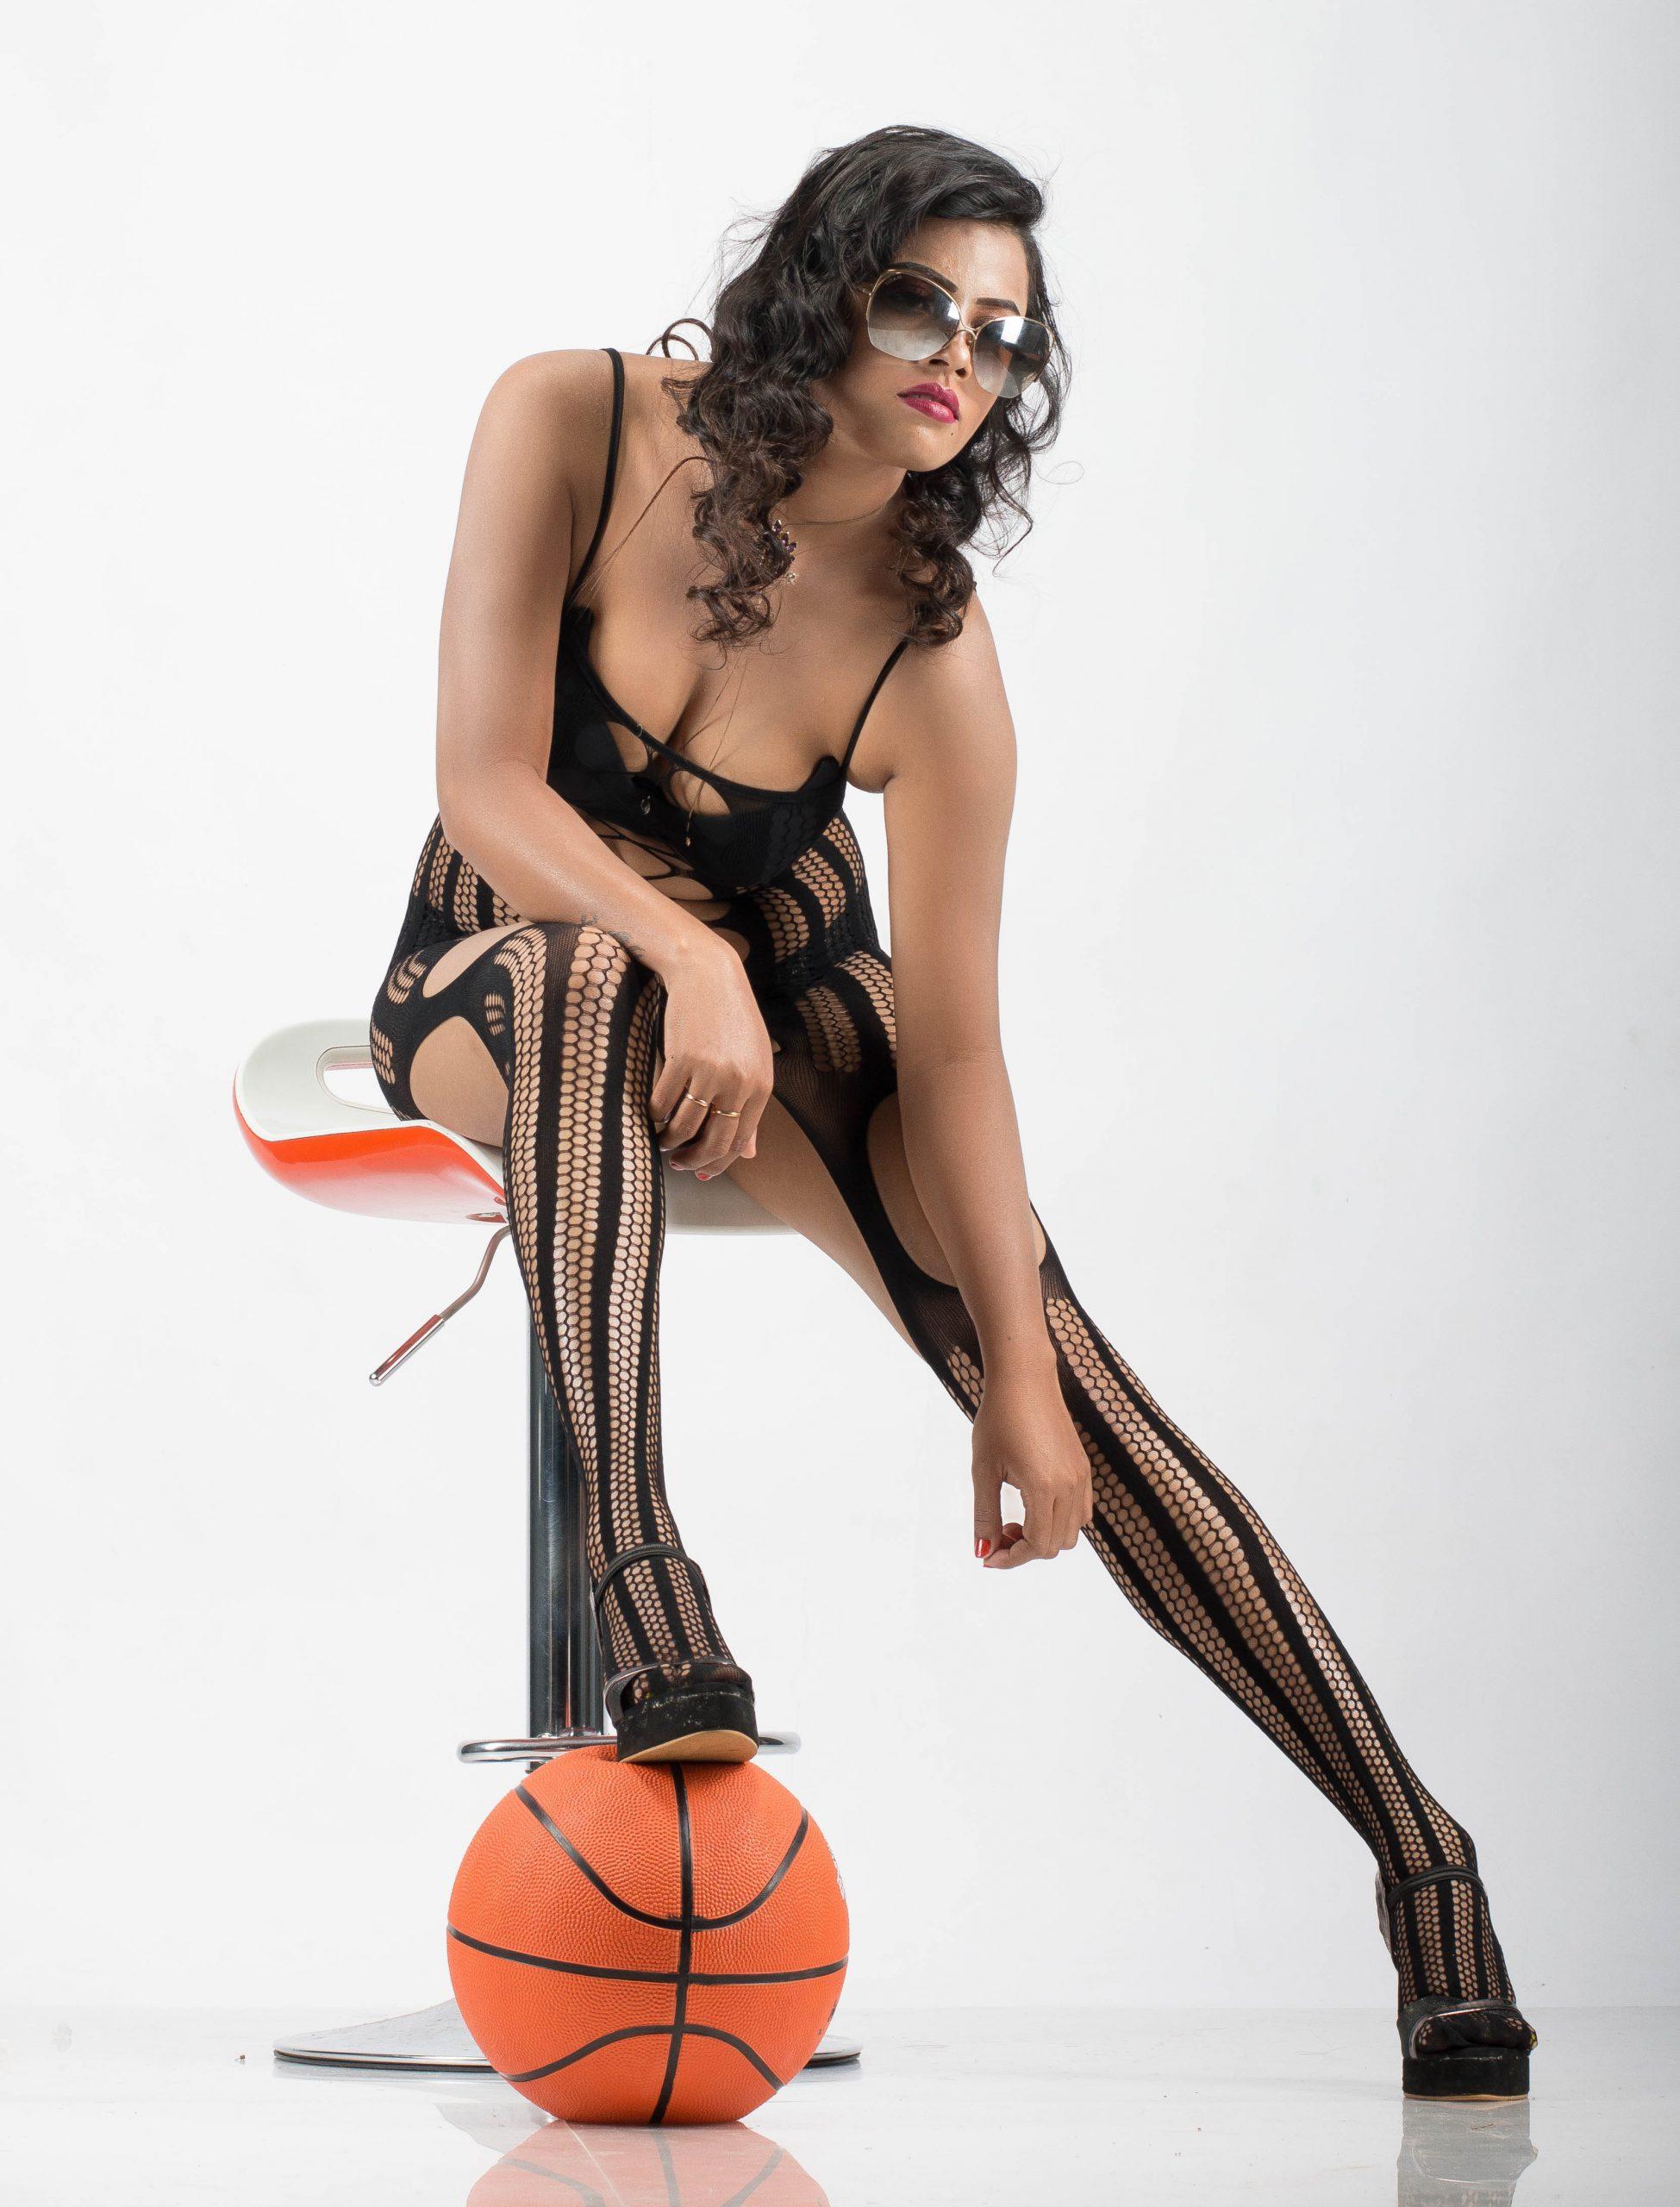 A fashion model with a basket ball